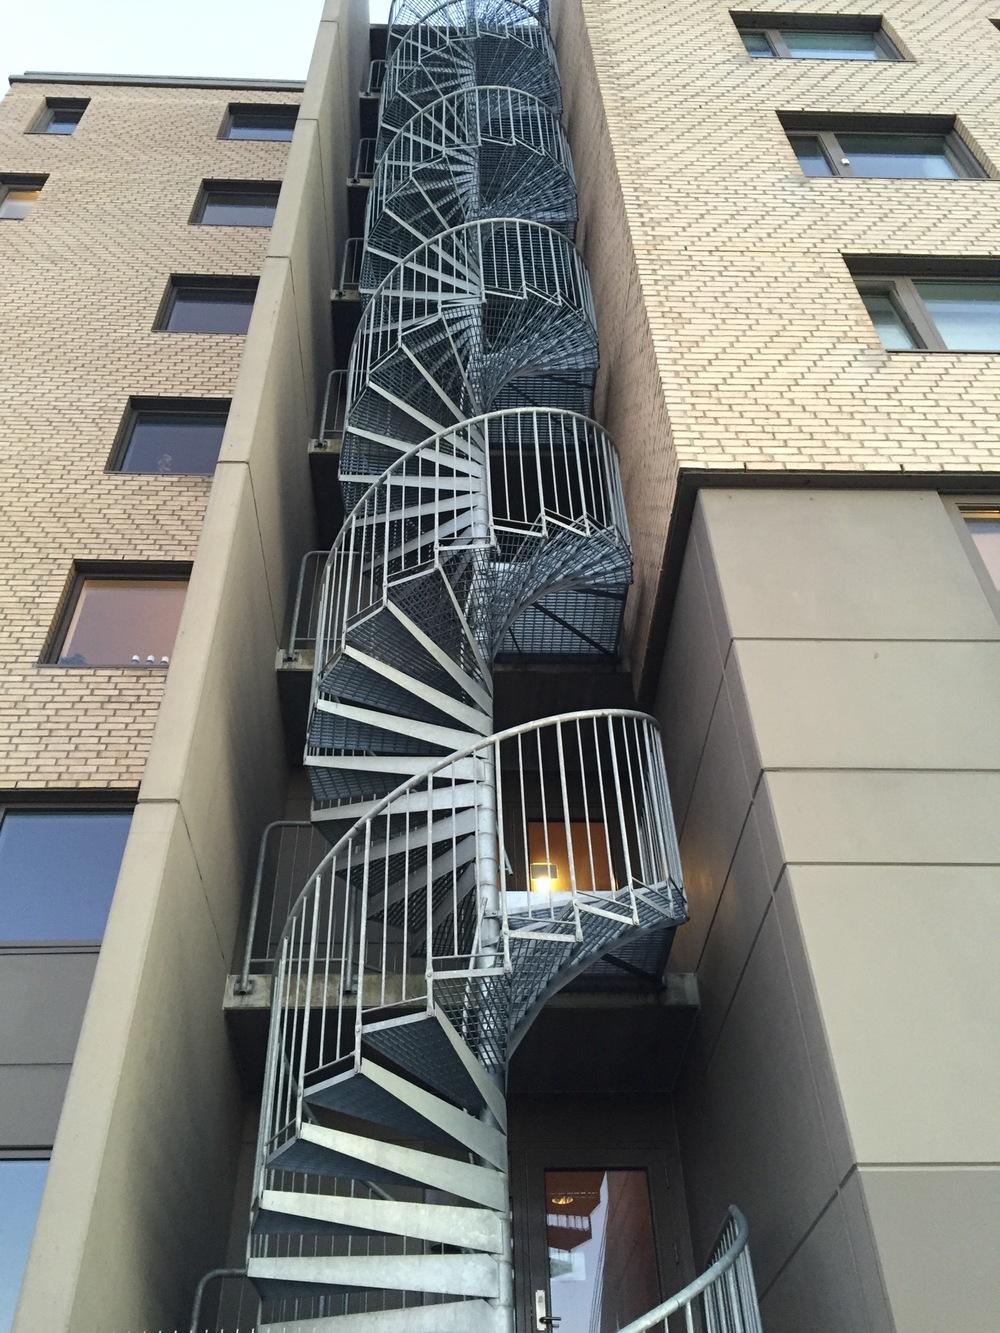 Stavanger - Stairs.jpg